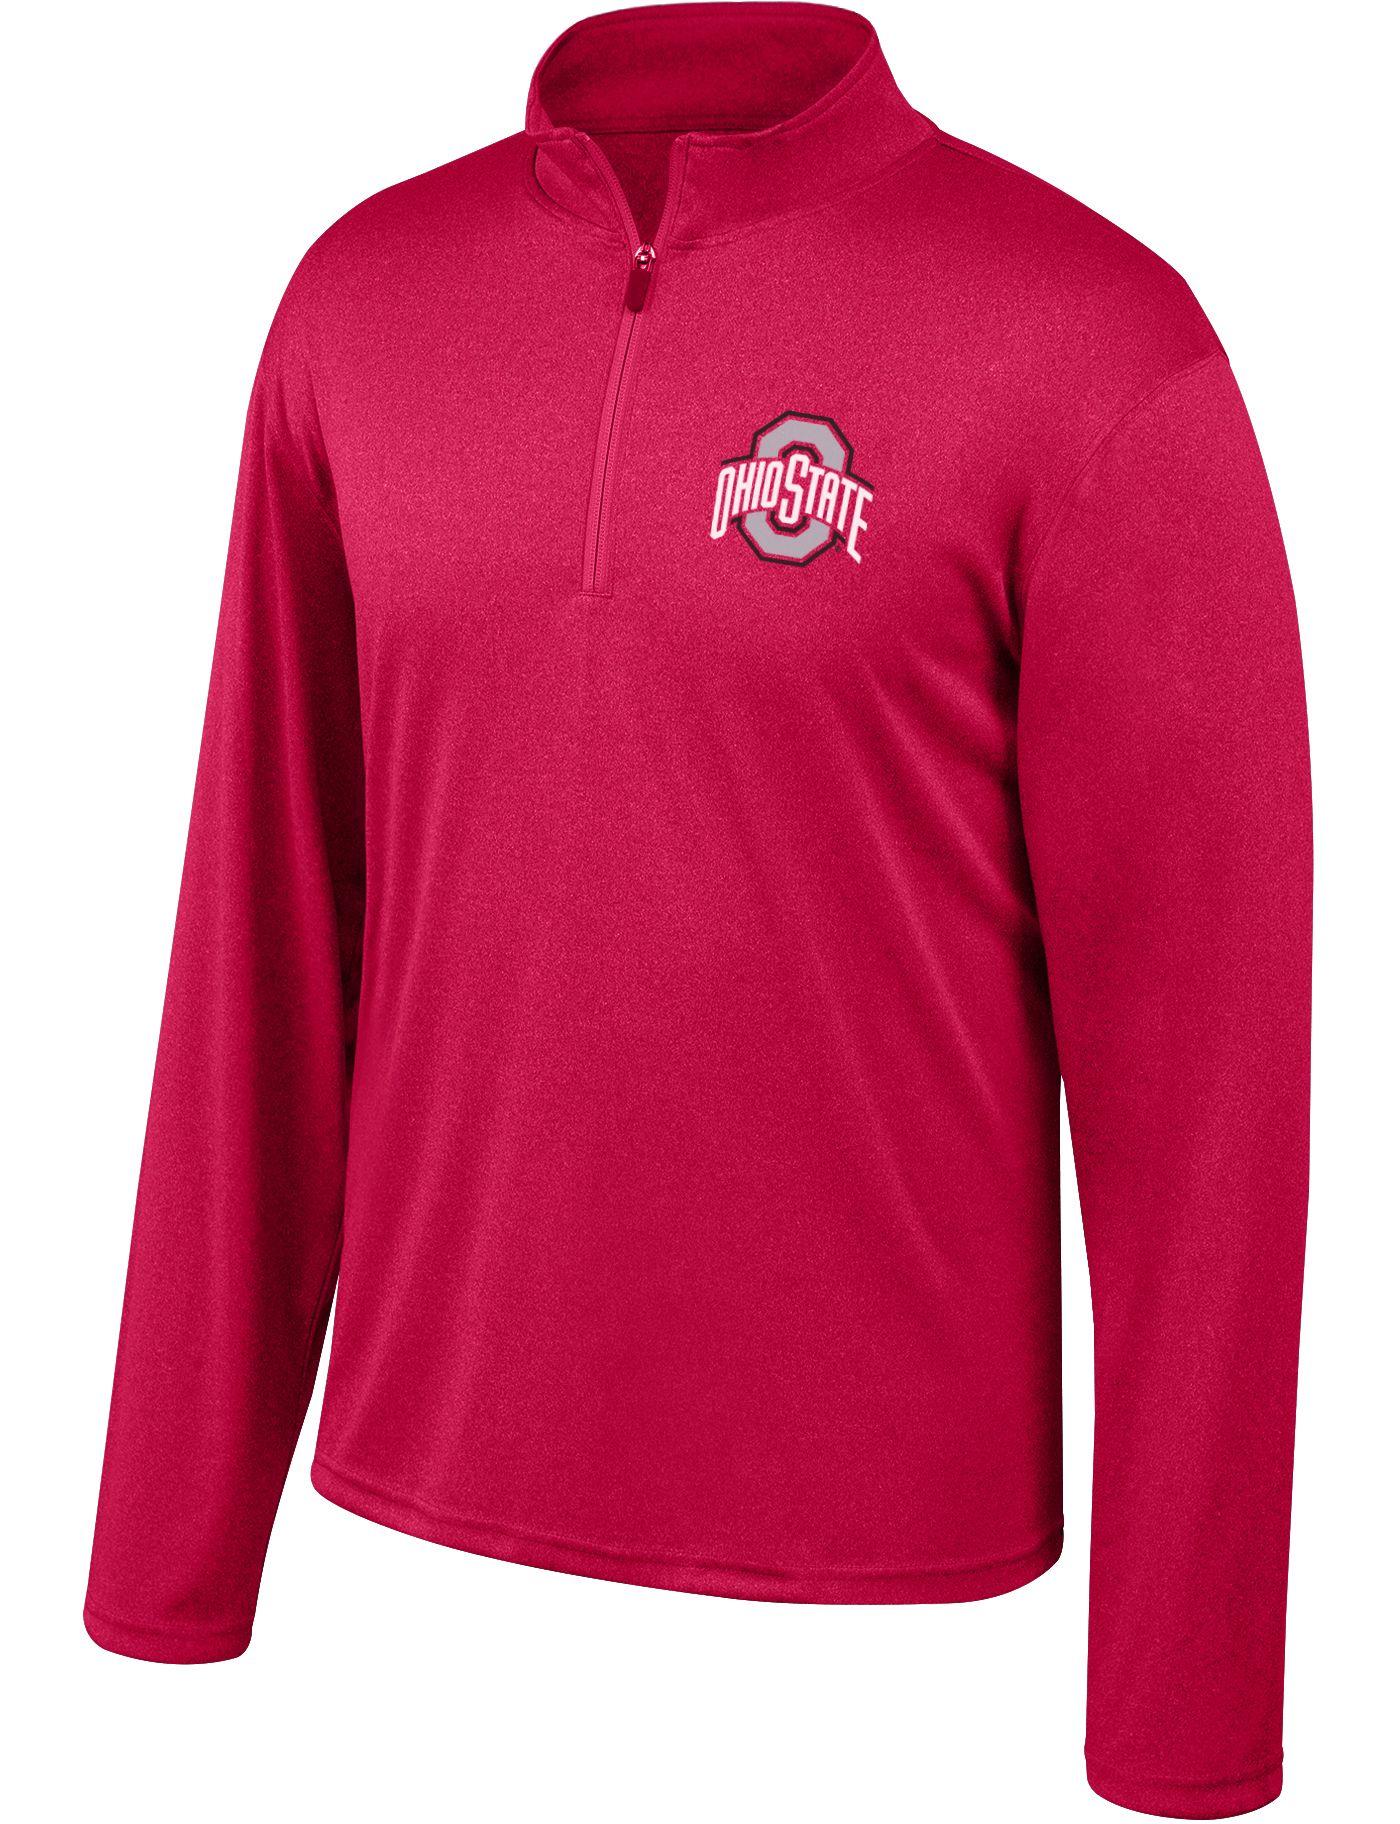 Scarlet & Gray Men's Ohio State Buckeyes Scarlet Quarter-Zip Shirt